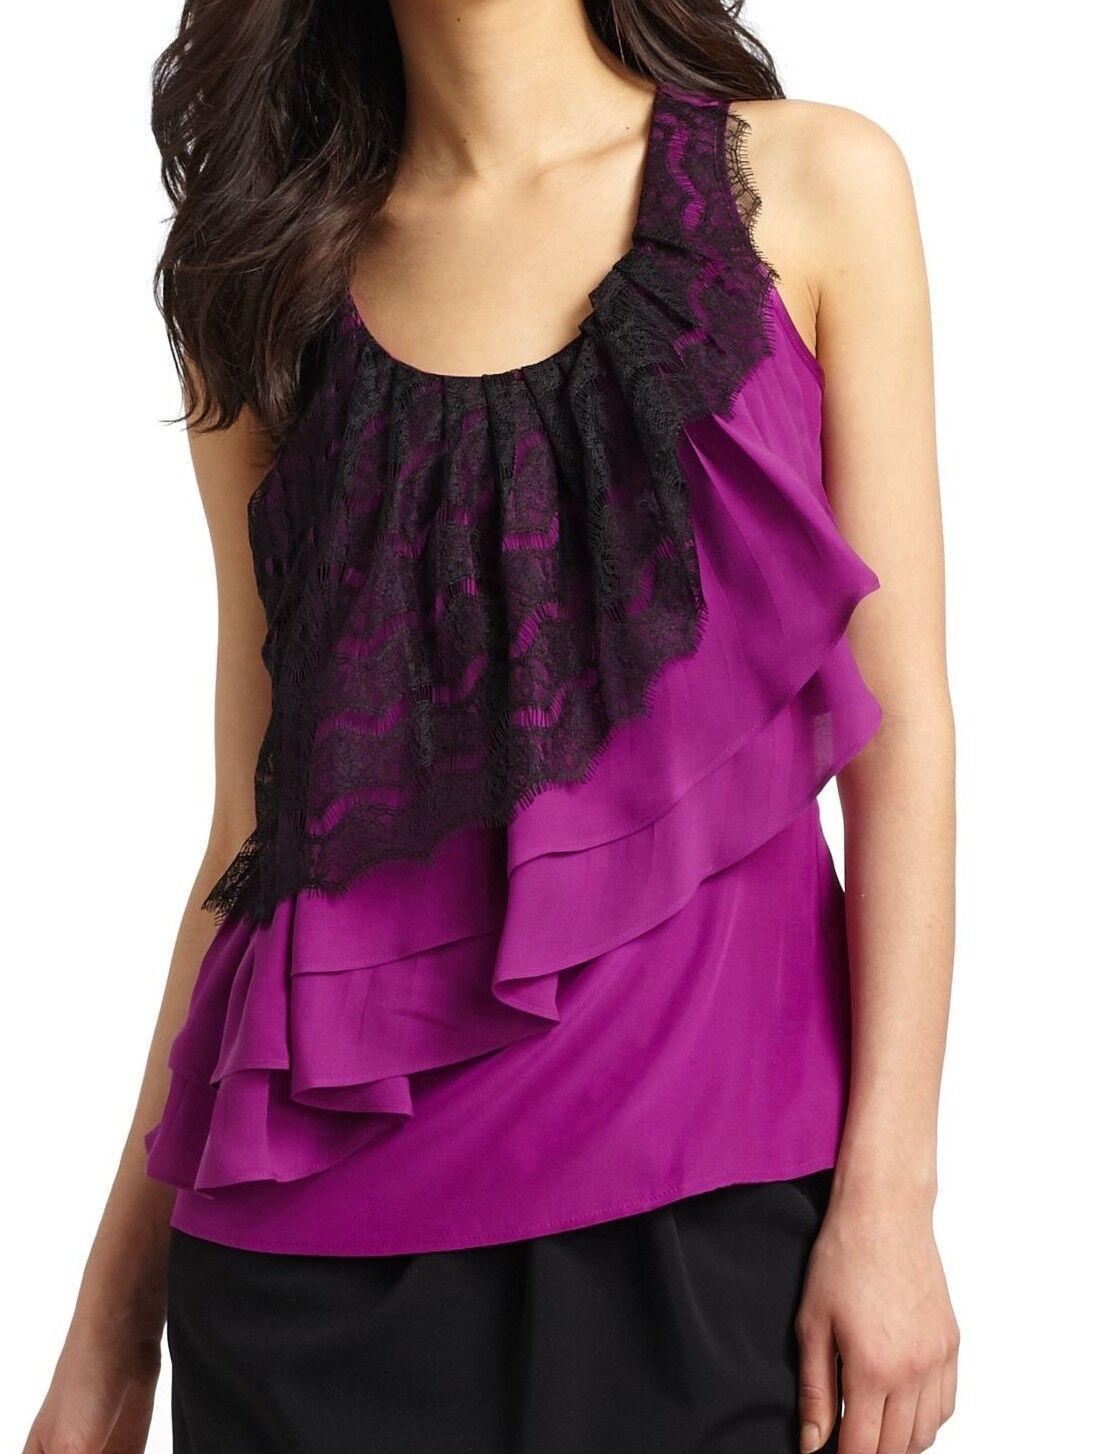 Cynthia Steffe MEMPHIS Silk Lace Ruffle Dress Top Blouse lila 6 Nwt